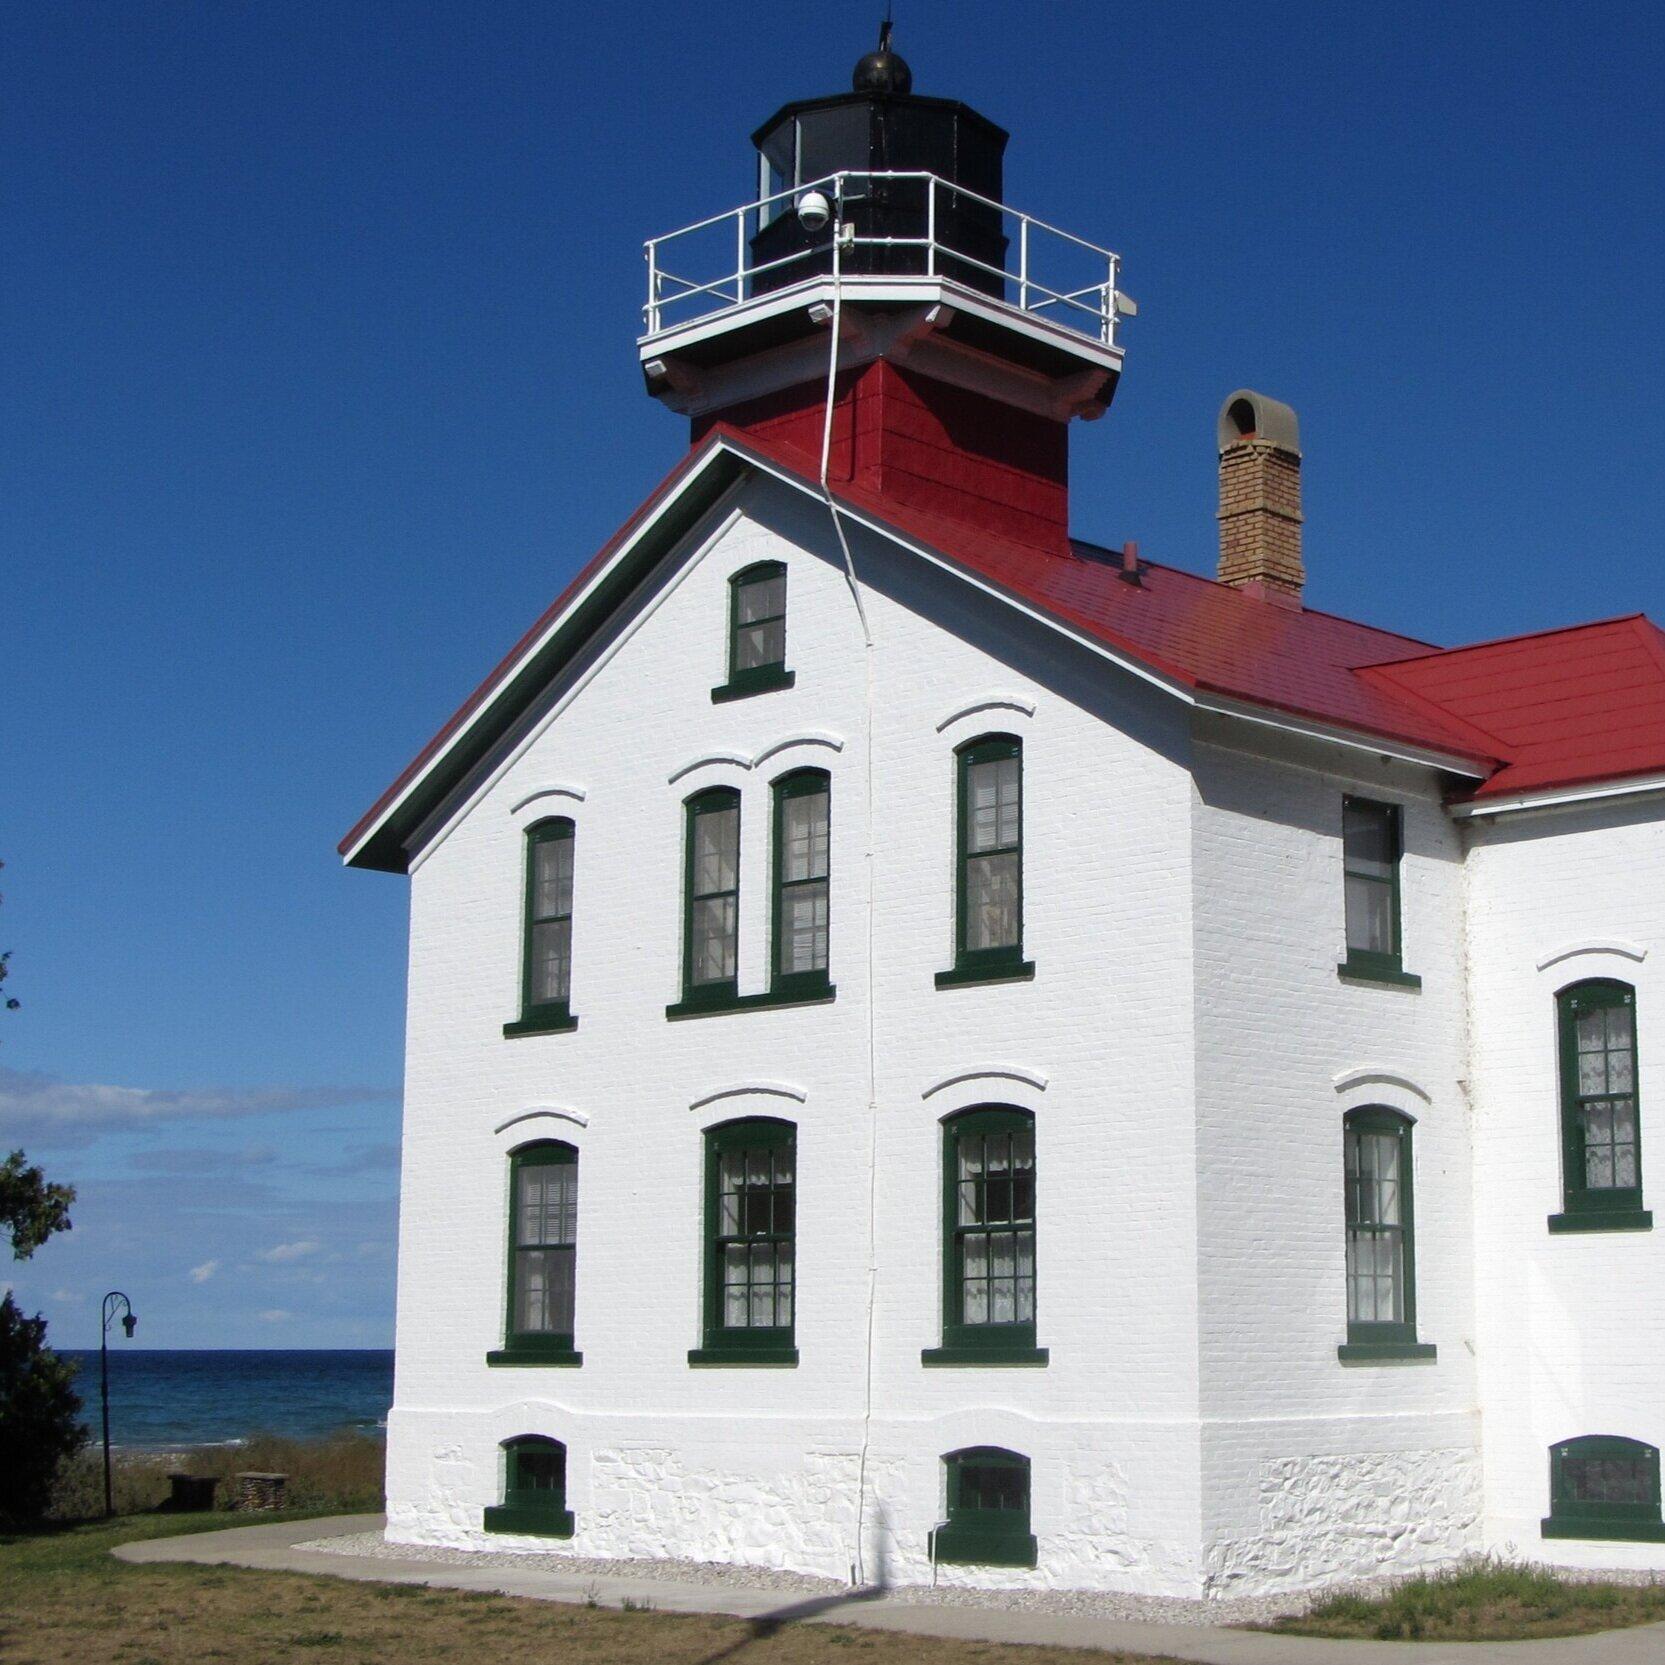 The_Grand_Traverse_Lighthouse_on_Lake_Michigan.jpg